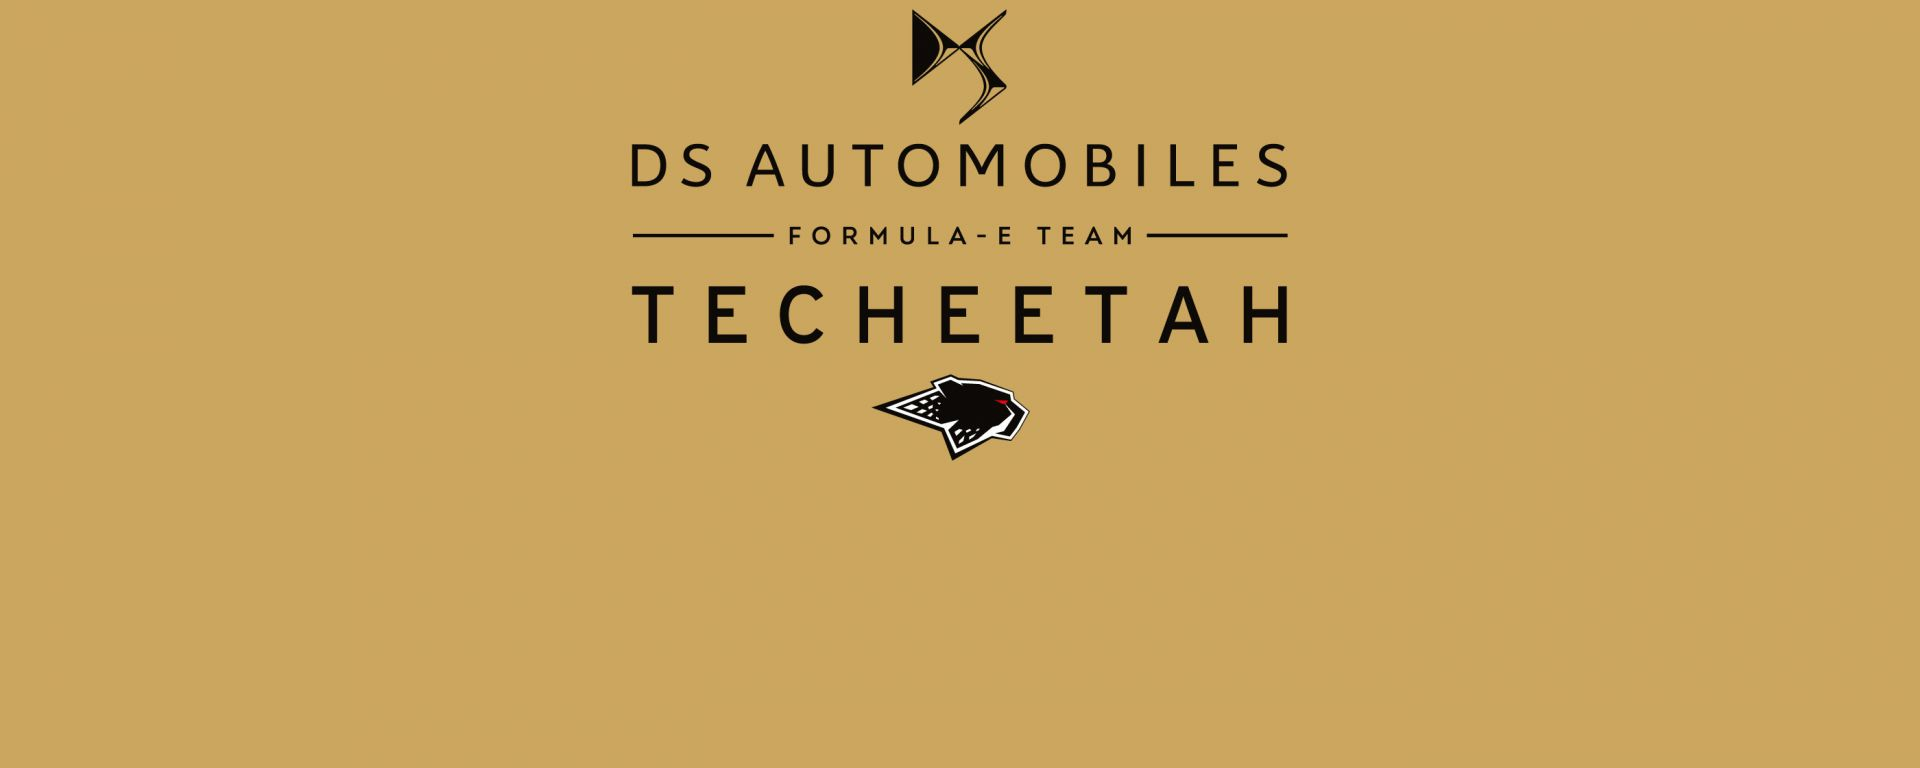 Il logo del DS Techeetah Formula E Team